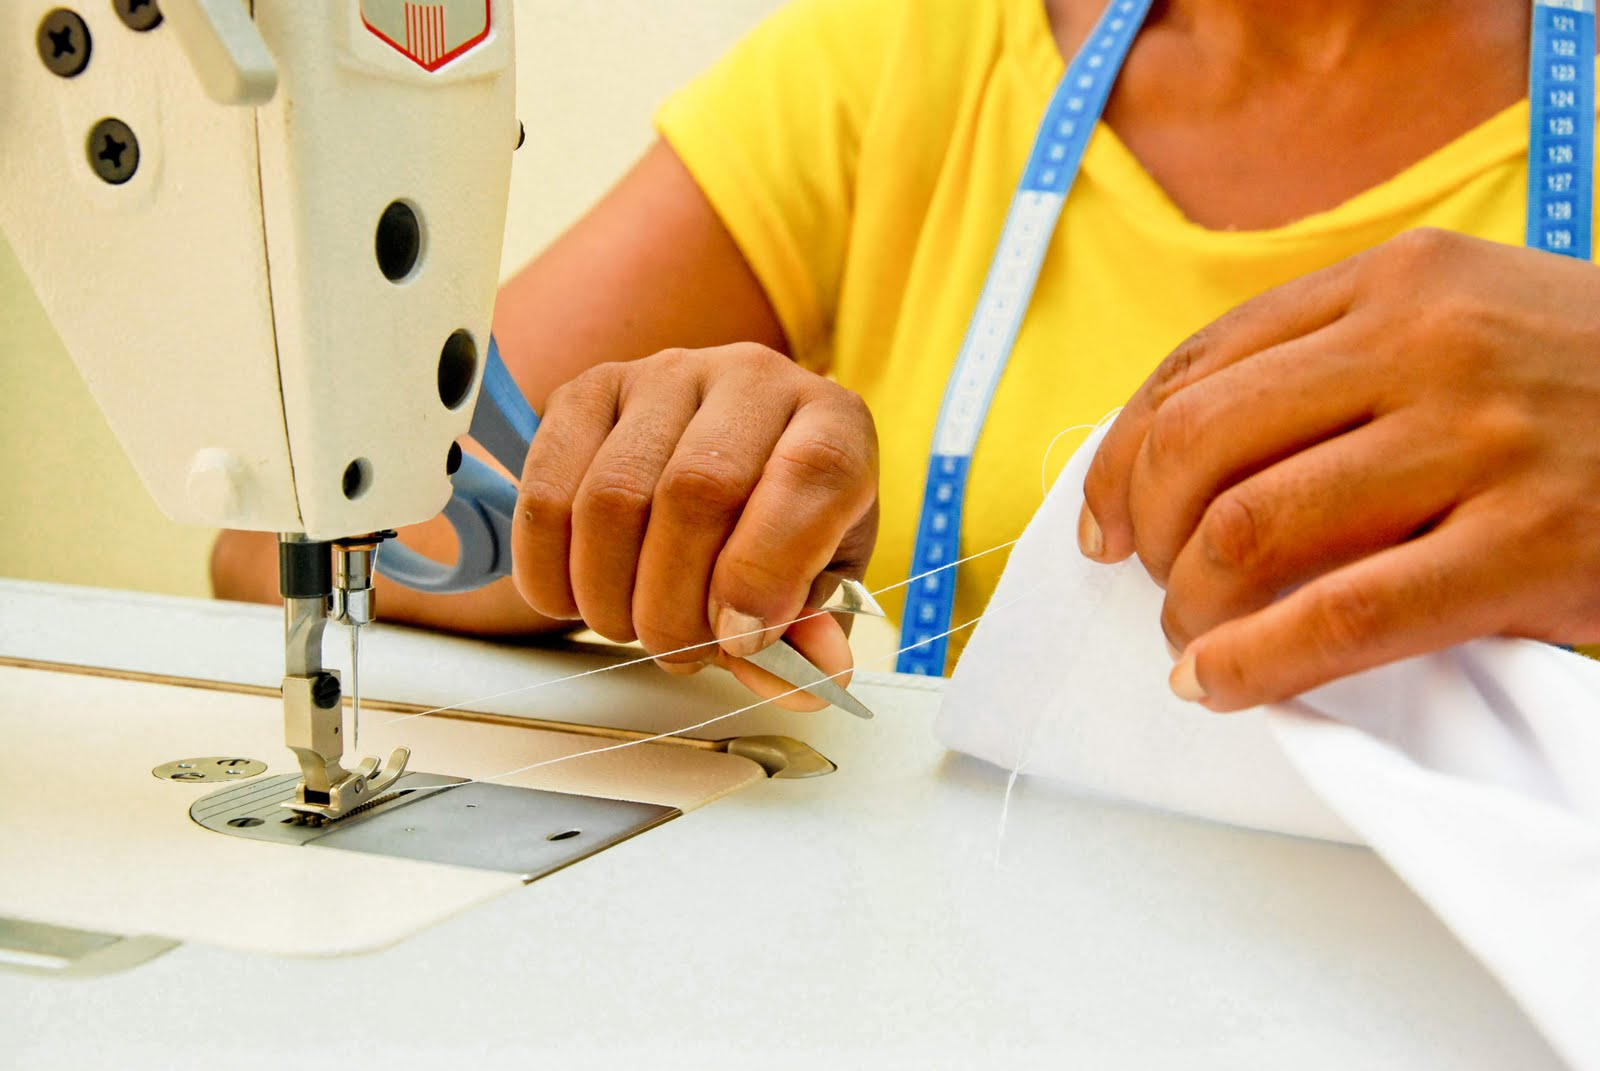 Curso de corte e costura pelo sebrae